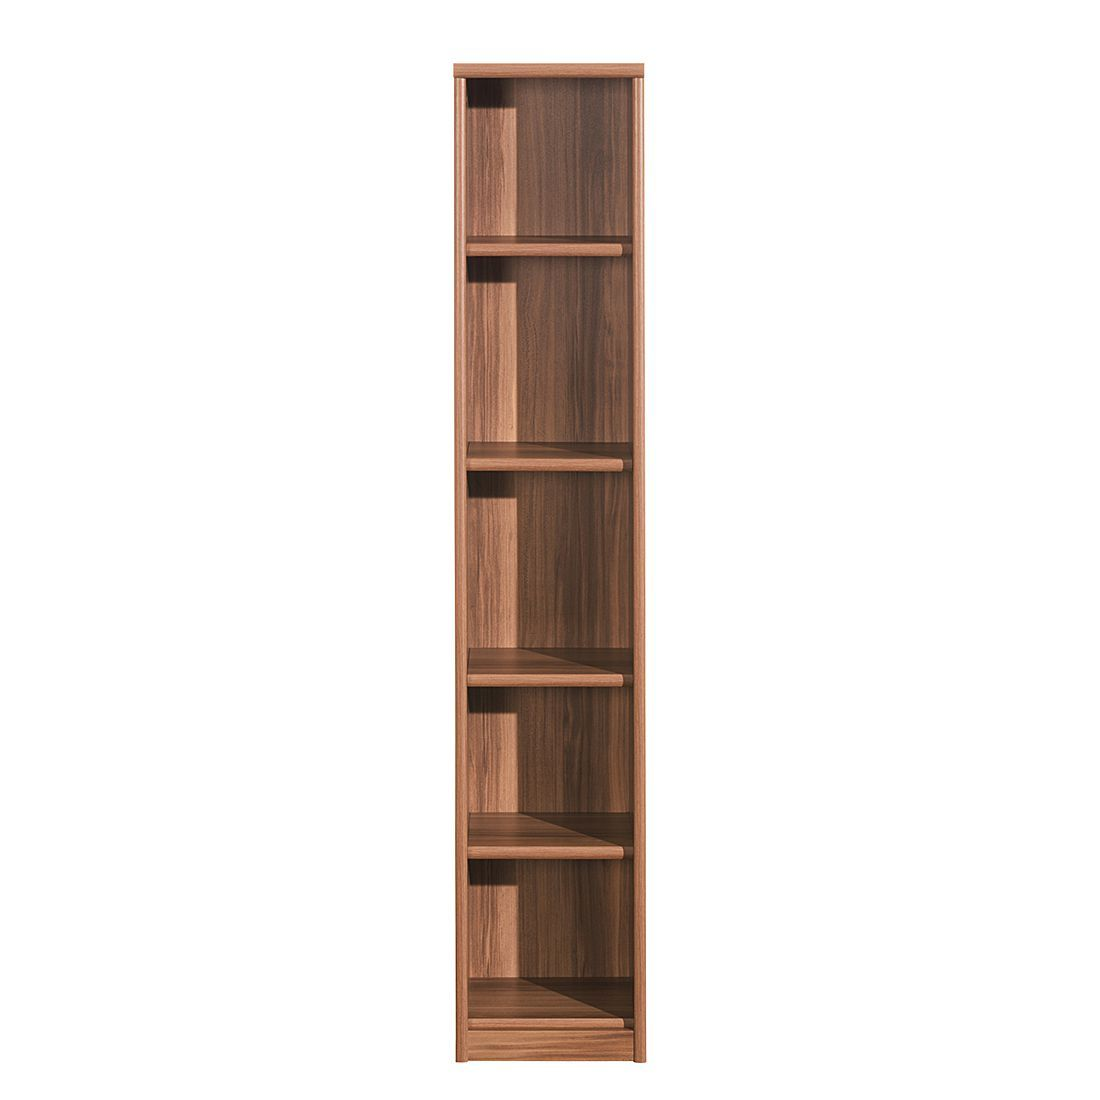 cd regal soft plus i nussbaum dekor cs schmal jetzt bestellen unter https moebel. Black Bedroom Furniture Sets. Home Design Ideas